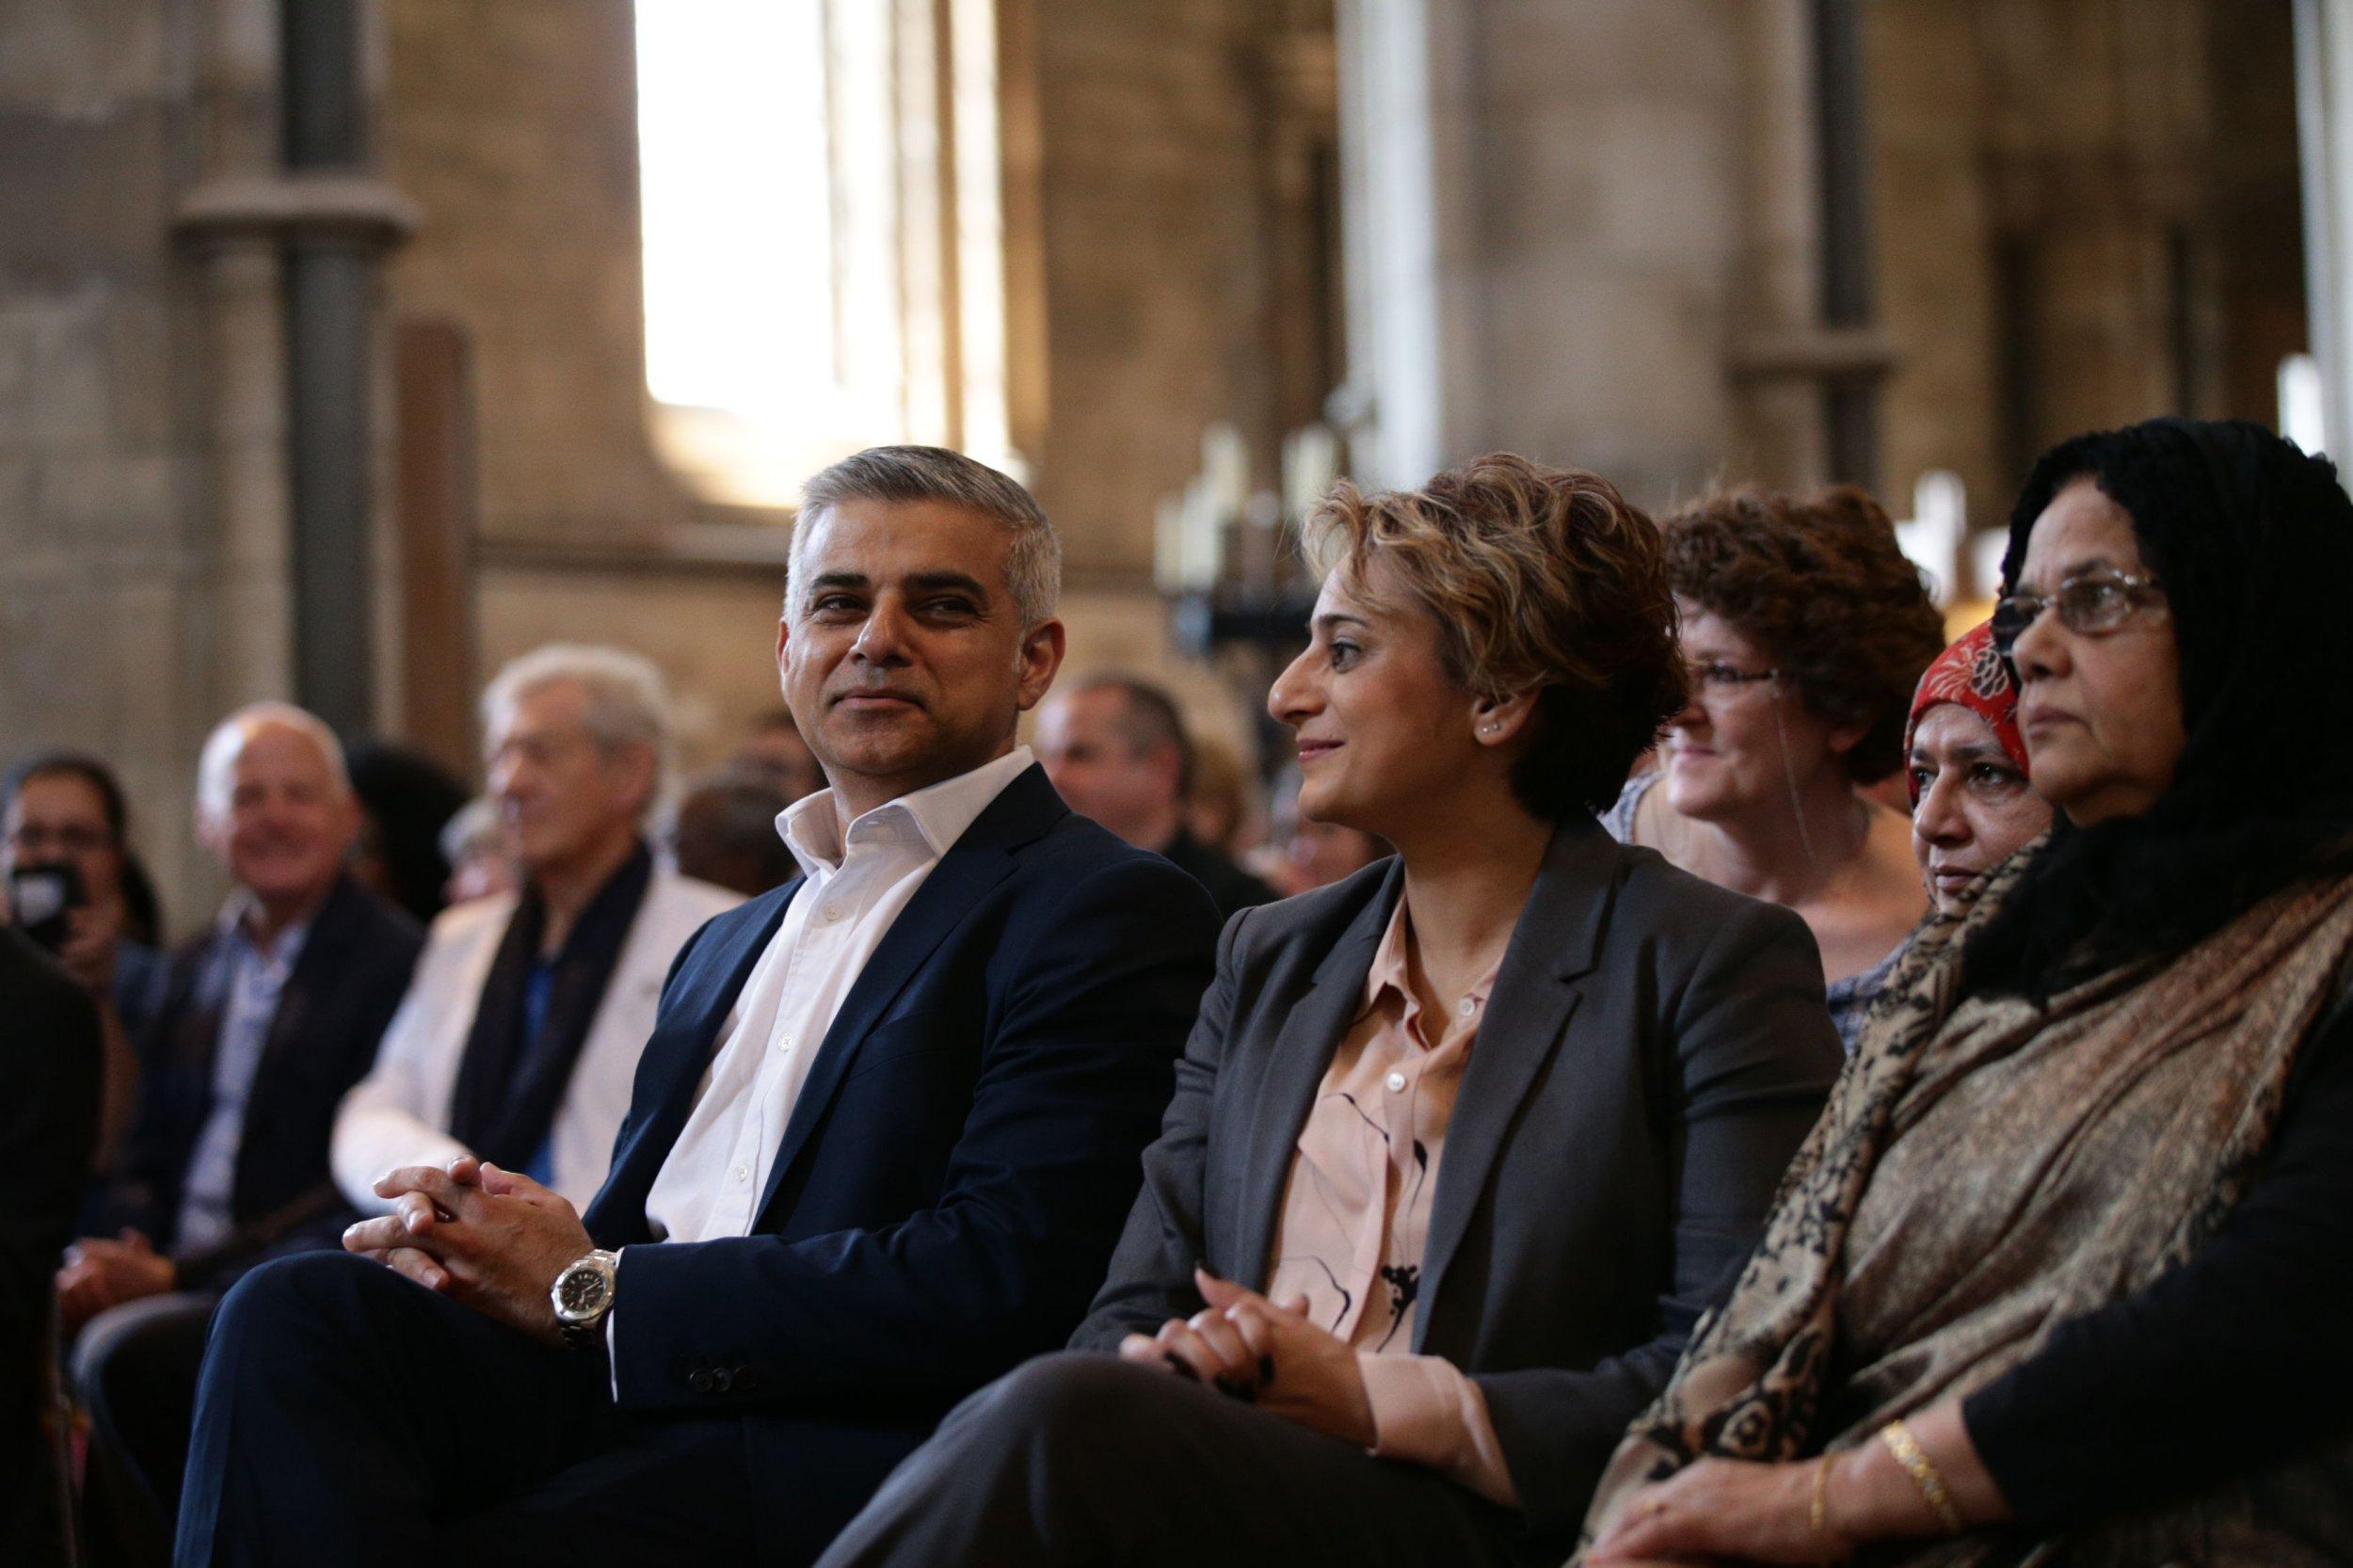 Sadiq Khan has been officially sworn in as Mayor of London